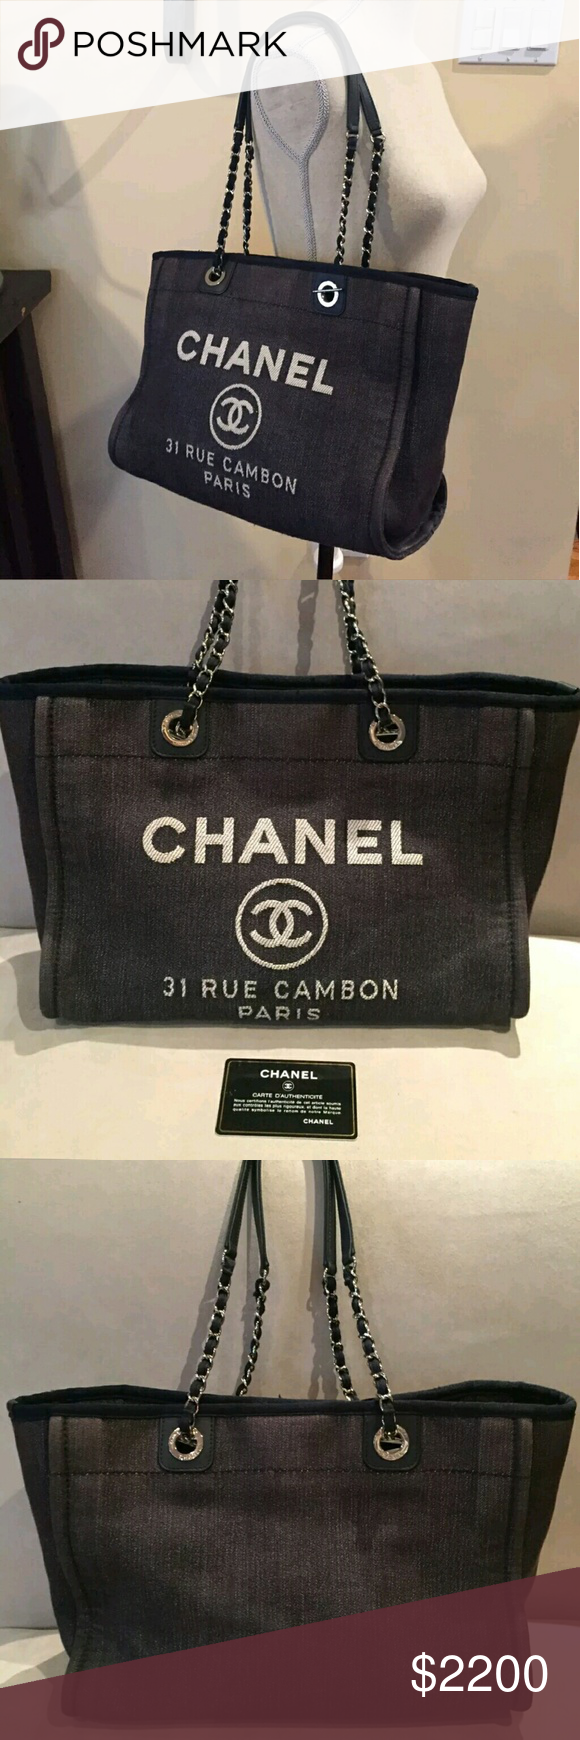 ec0b24bcee986 Chanel deauville blue denim medium tote bag Chanel Medium Navy Blue Denim  Medium Deauville Tote Shoulder